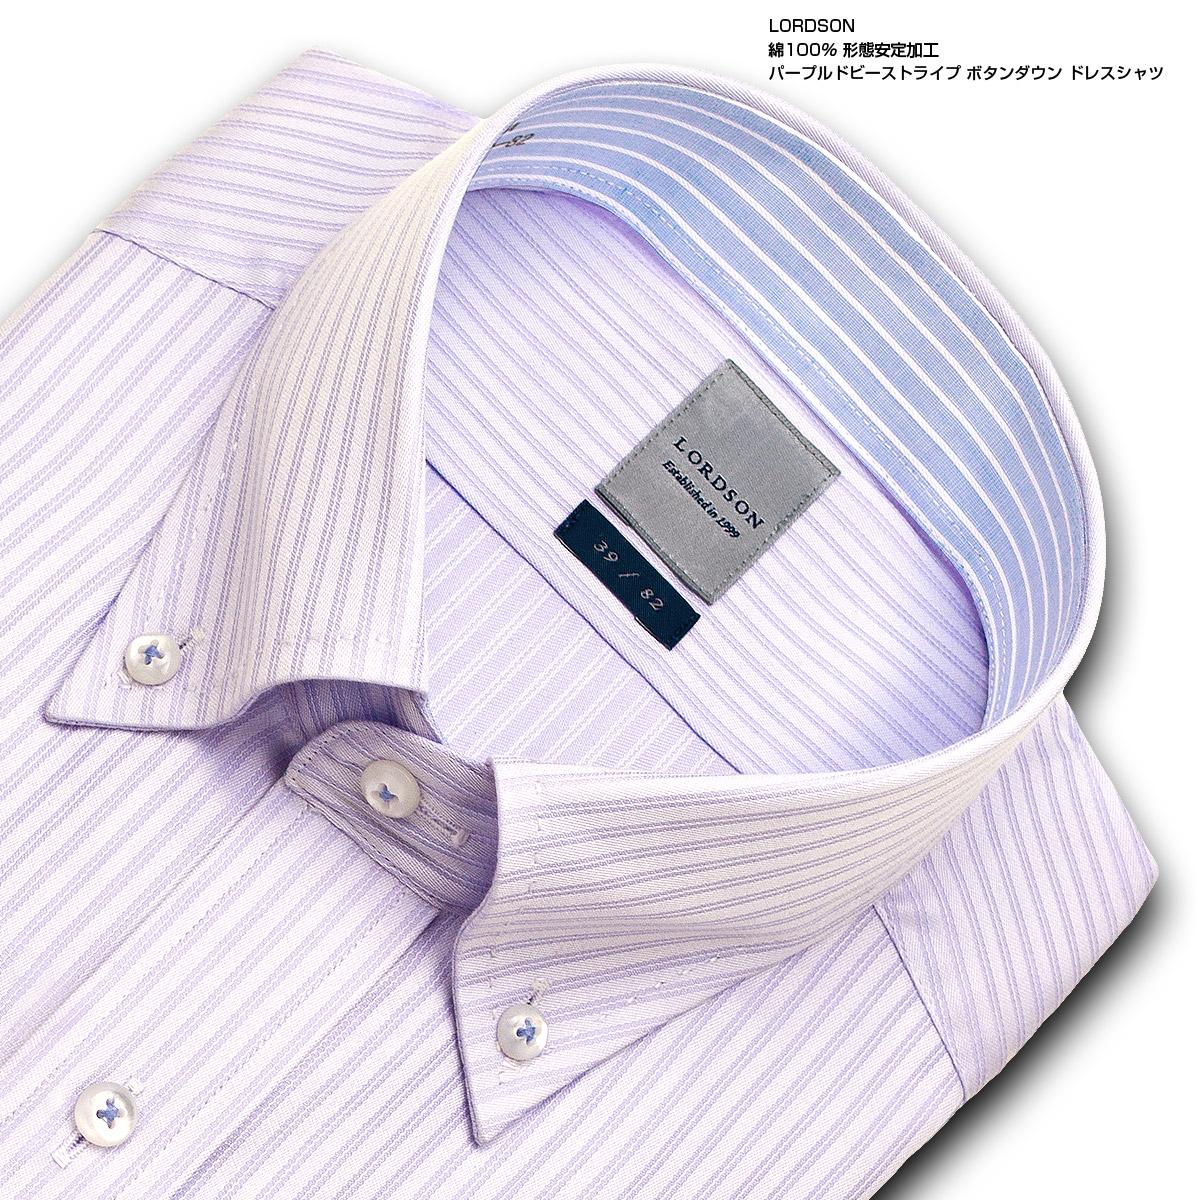 LORDSON 長袖 ワイシャツ メンズ 春夏秋冬 形態安定加工 パープルドビーストライプ ボタンダウン   綿:100% 高級 上質 (zod897-260)